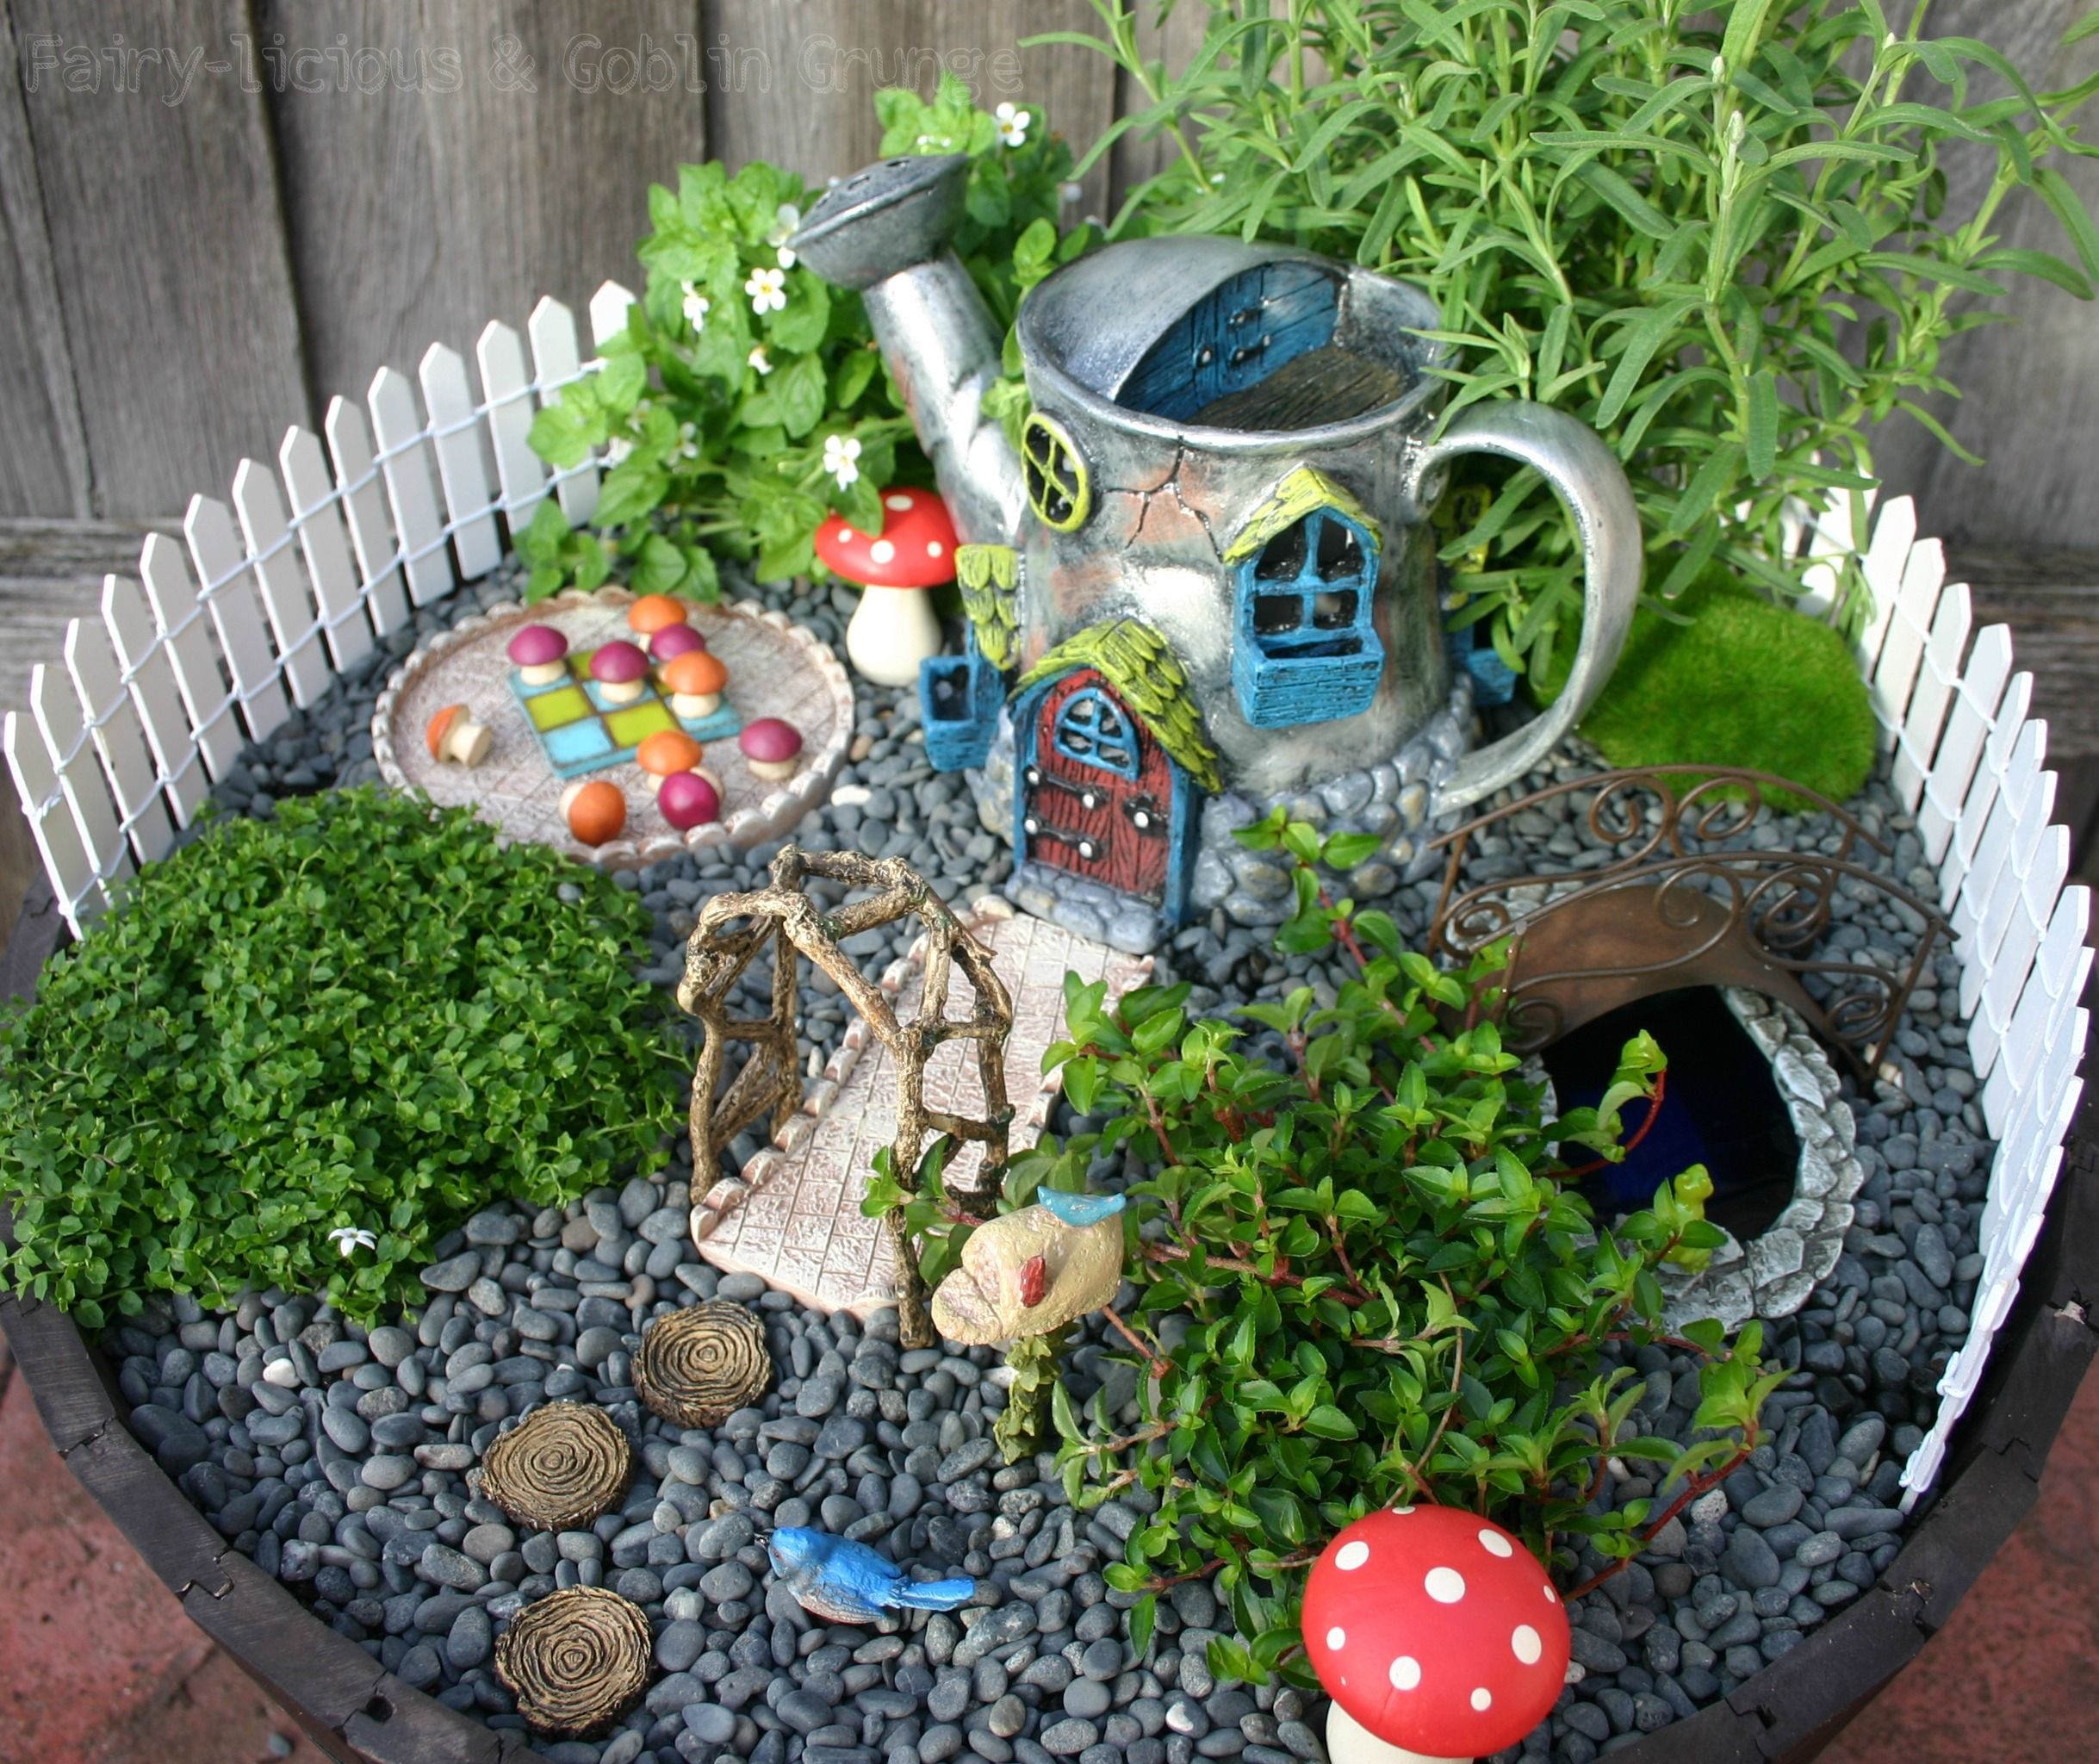 78 bsta bilder om Fairy Garden p Pinterest Fetrdgrdar